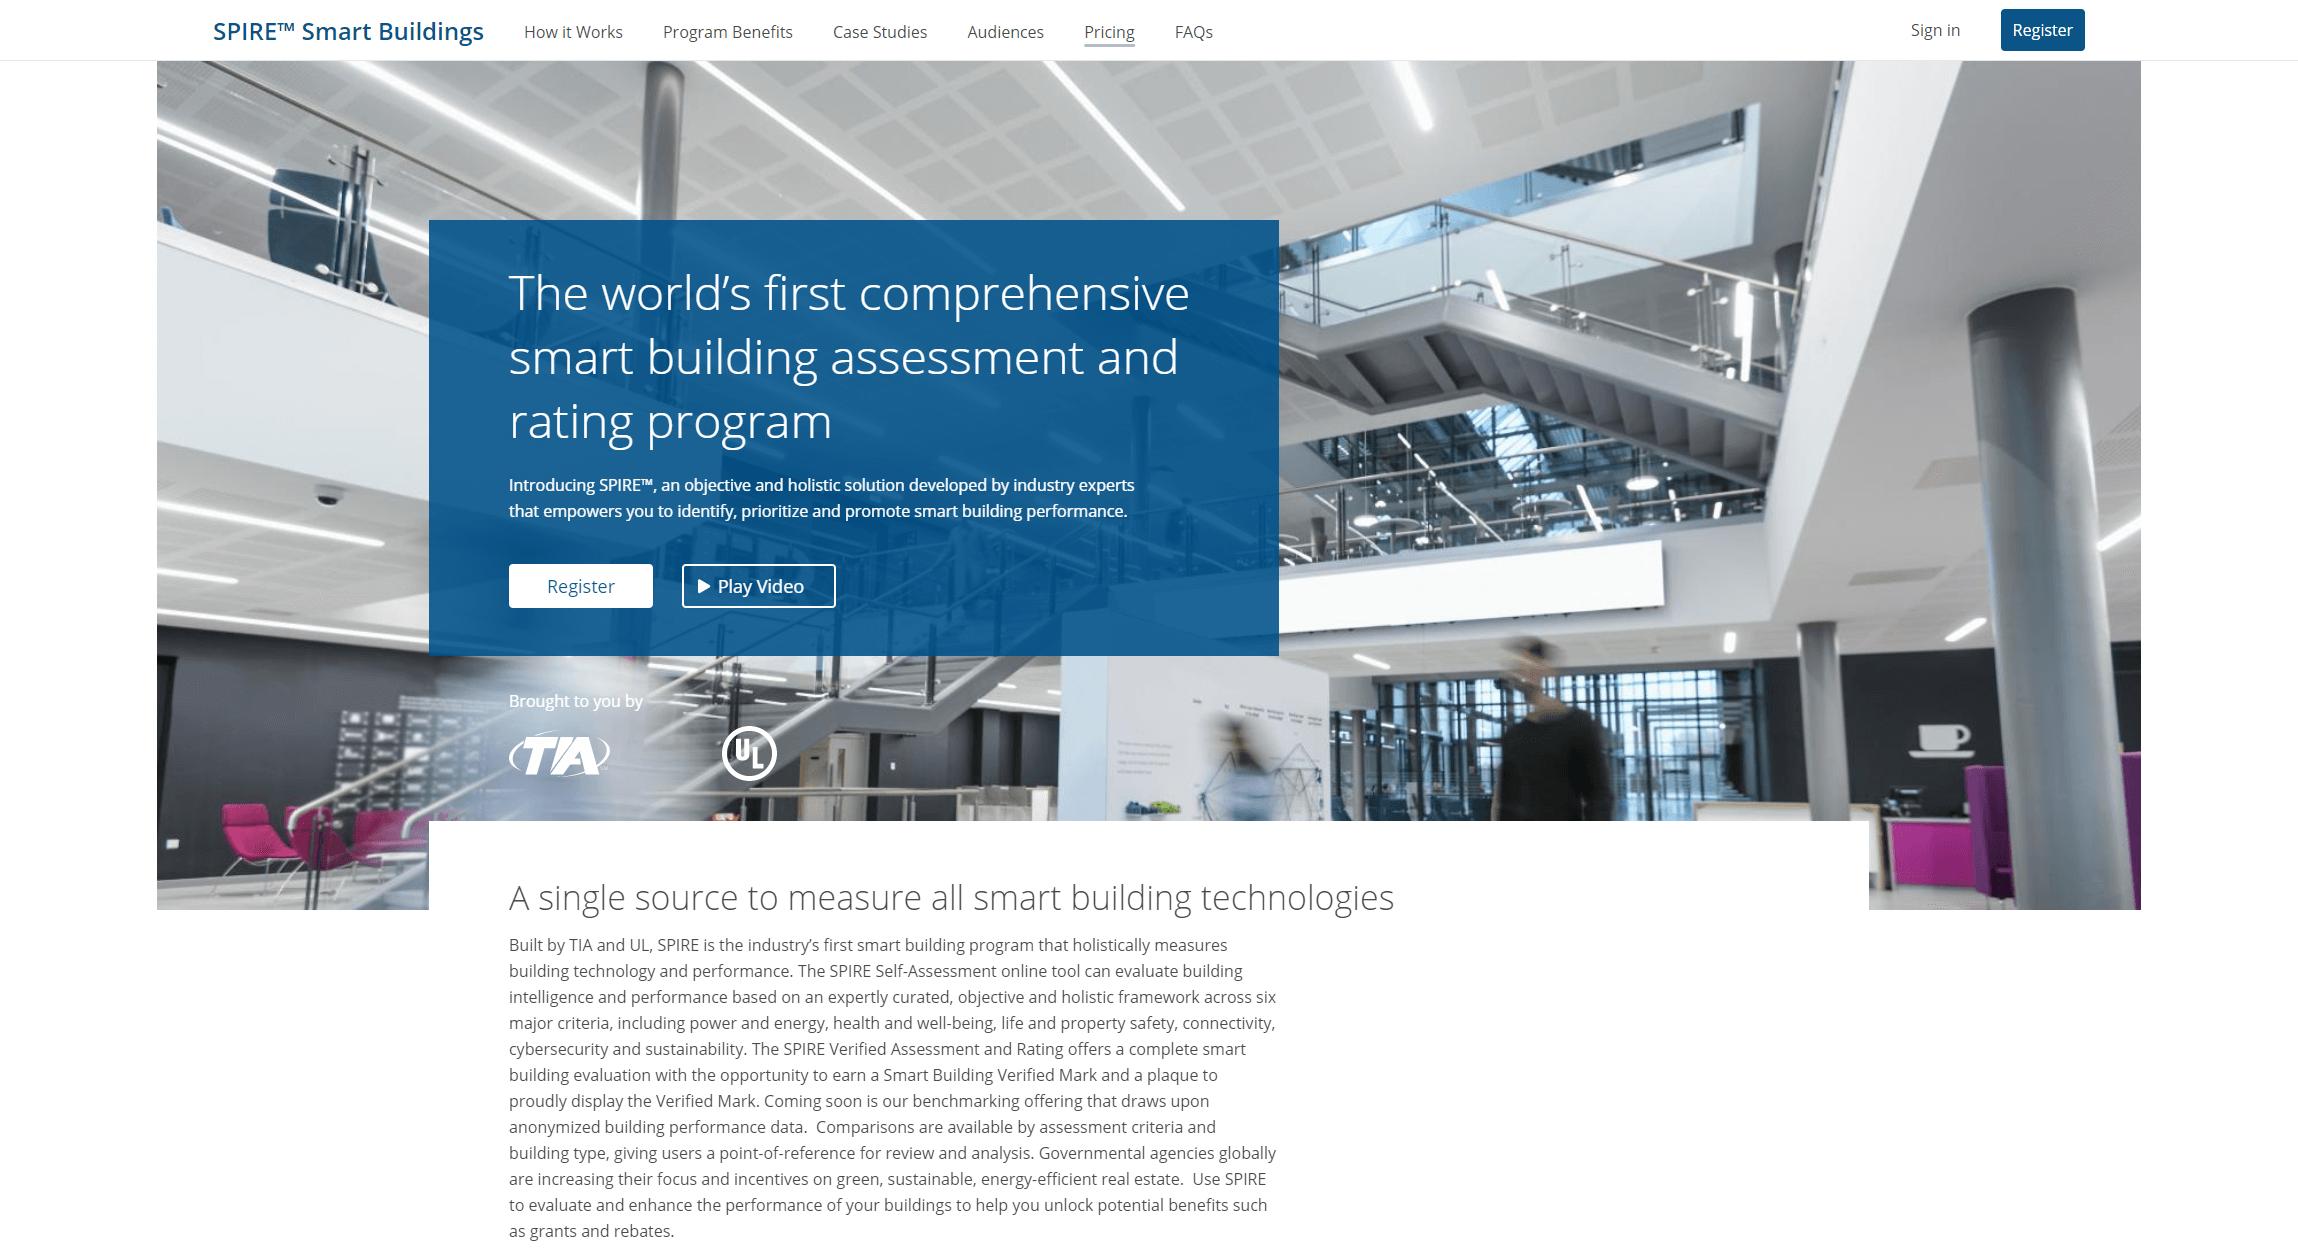 spiresmartbuildings.ul.com